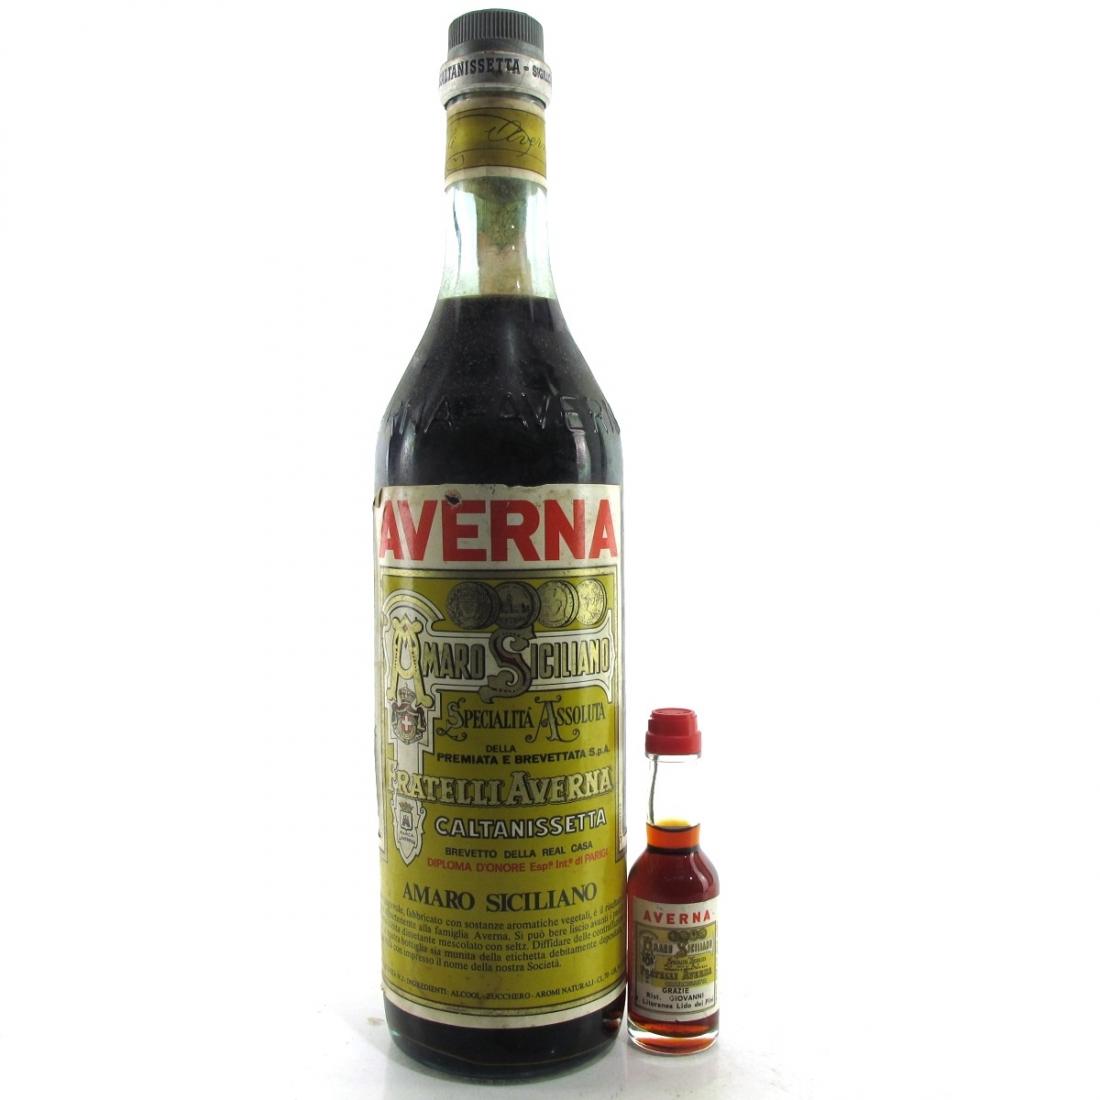 Averna Amaro Siciliano / including Miniature